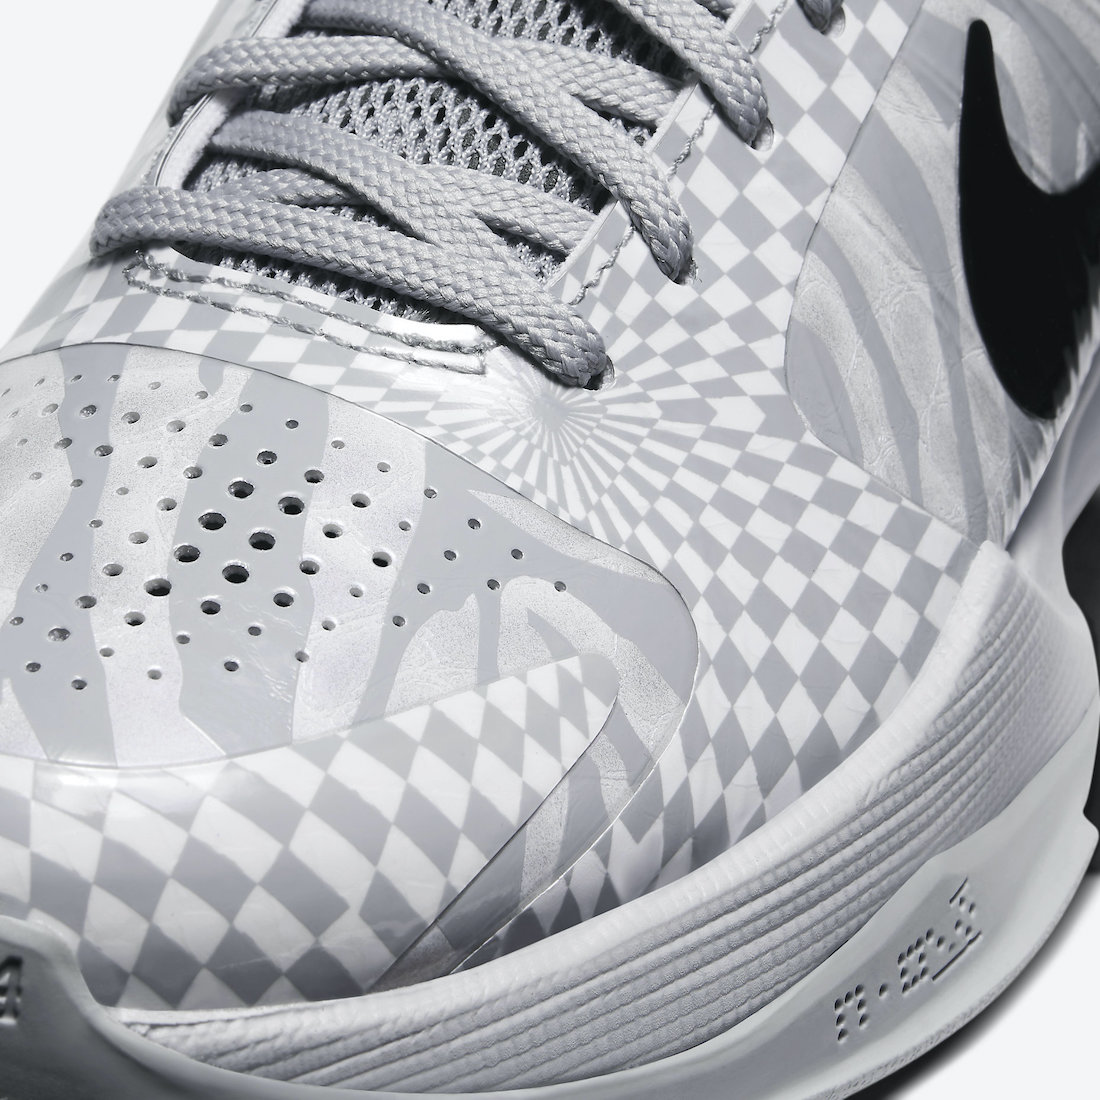 DeMar-DeRozan-Nike-Kobe-5-Protro-Zebra-CD4991-003-Release-Date-6